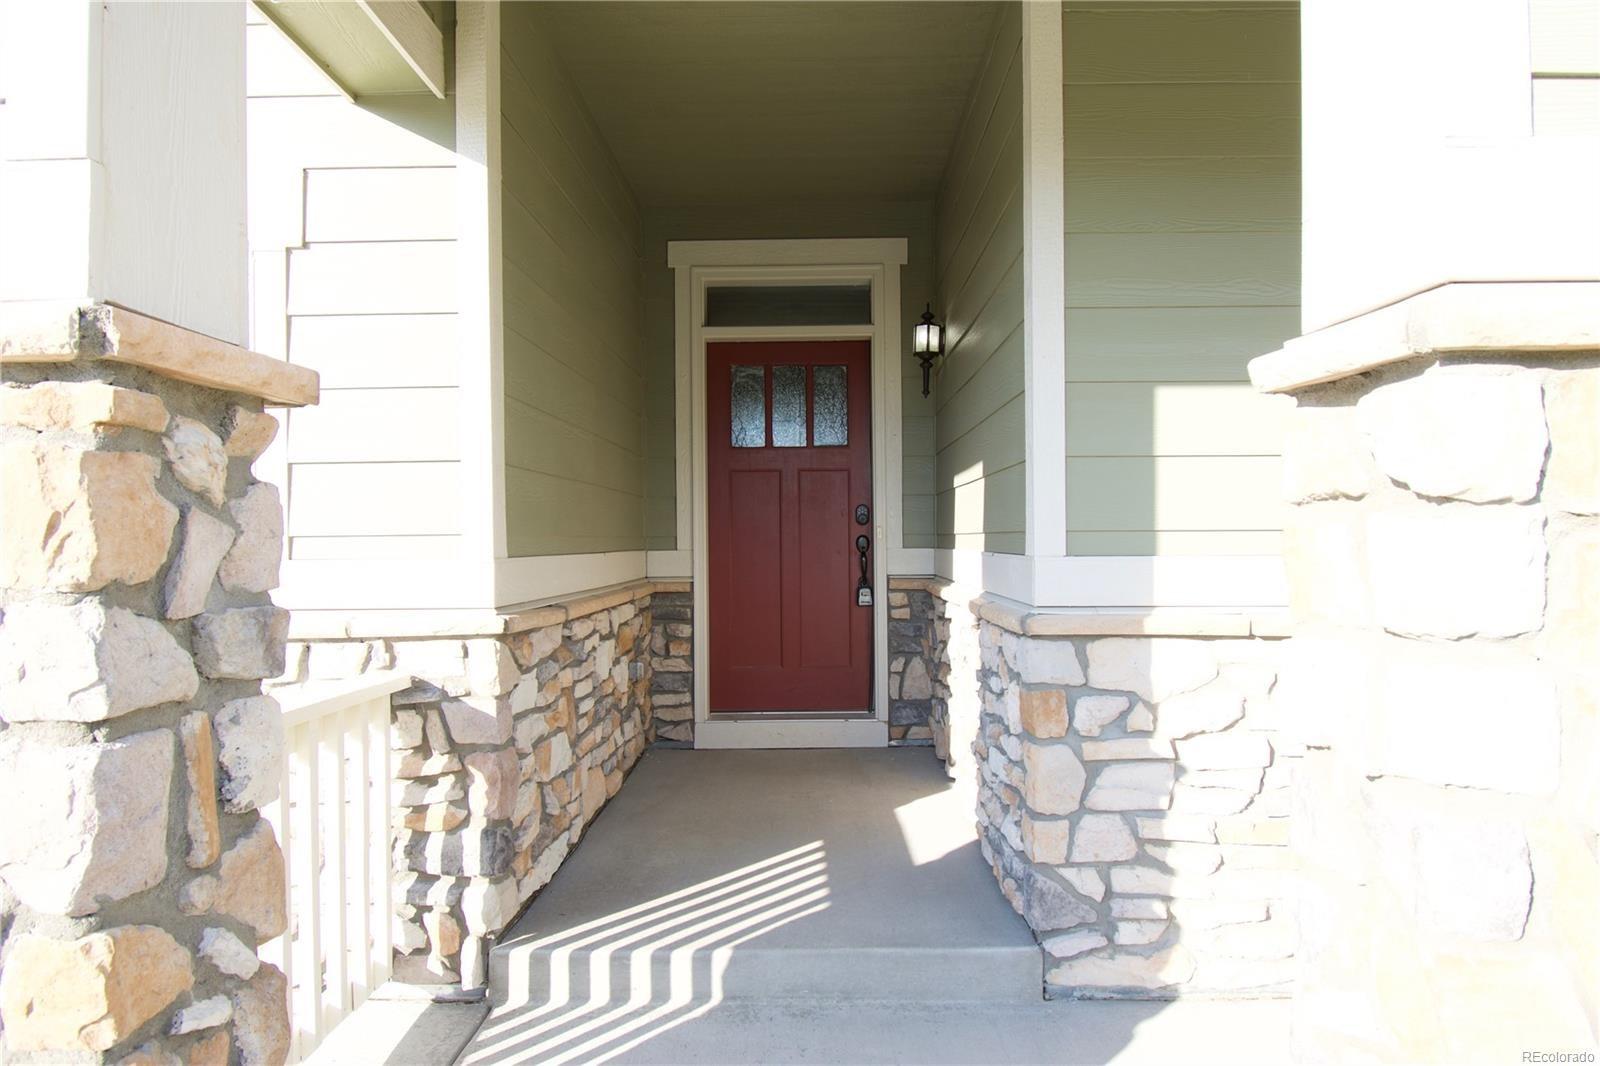 MLS# 5355621 - 4 - 784 Ellsworth Court, Castle Rock, CO 80104